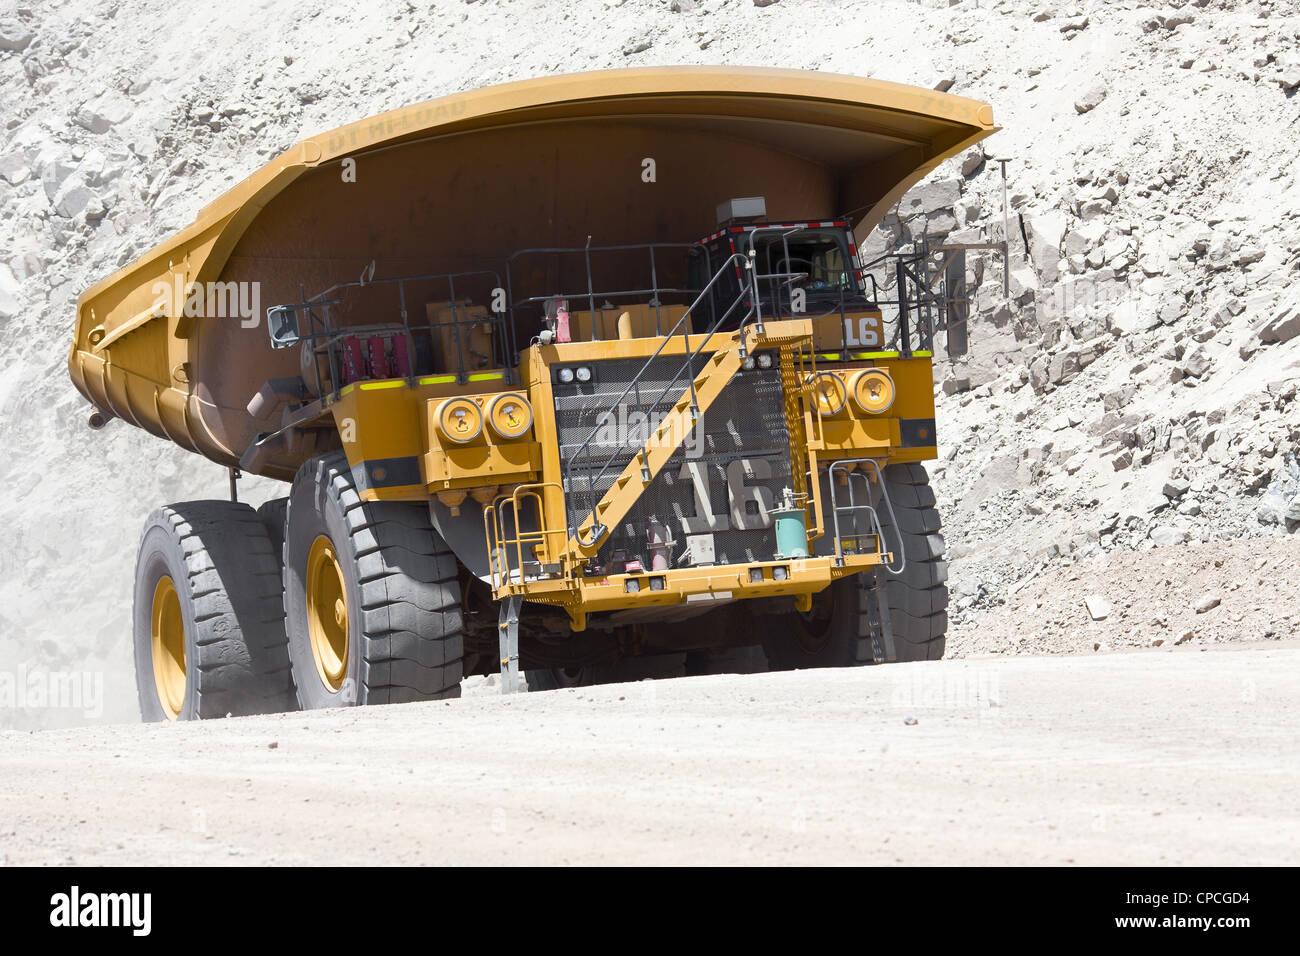 Dump Truck at Copper Mine in Chile - Stock Image